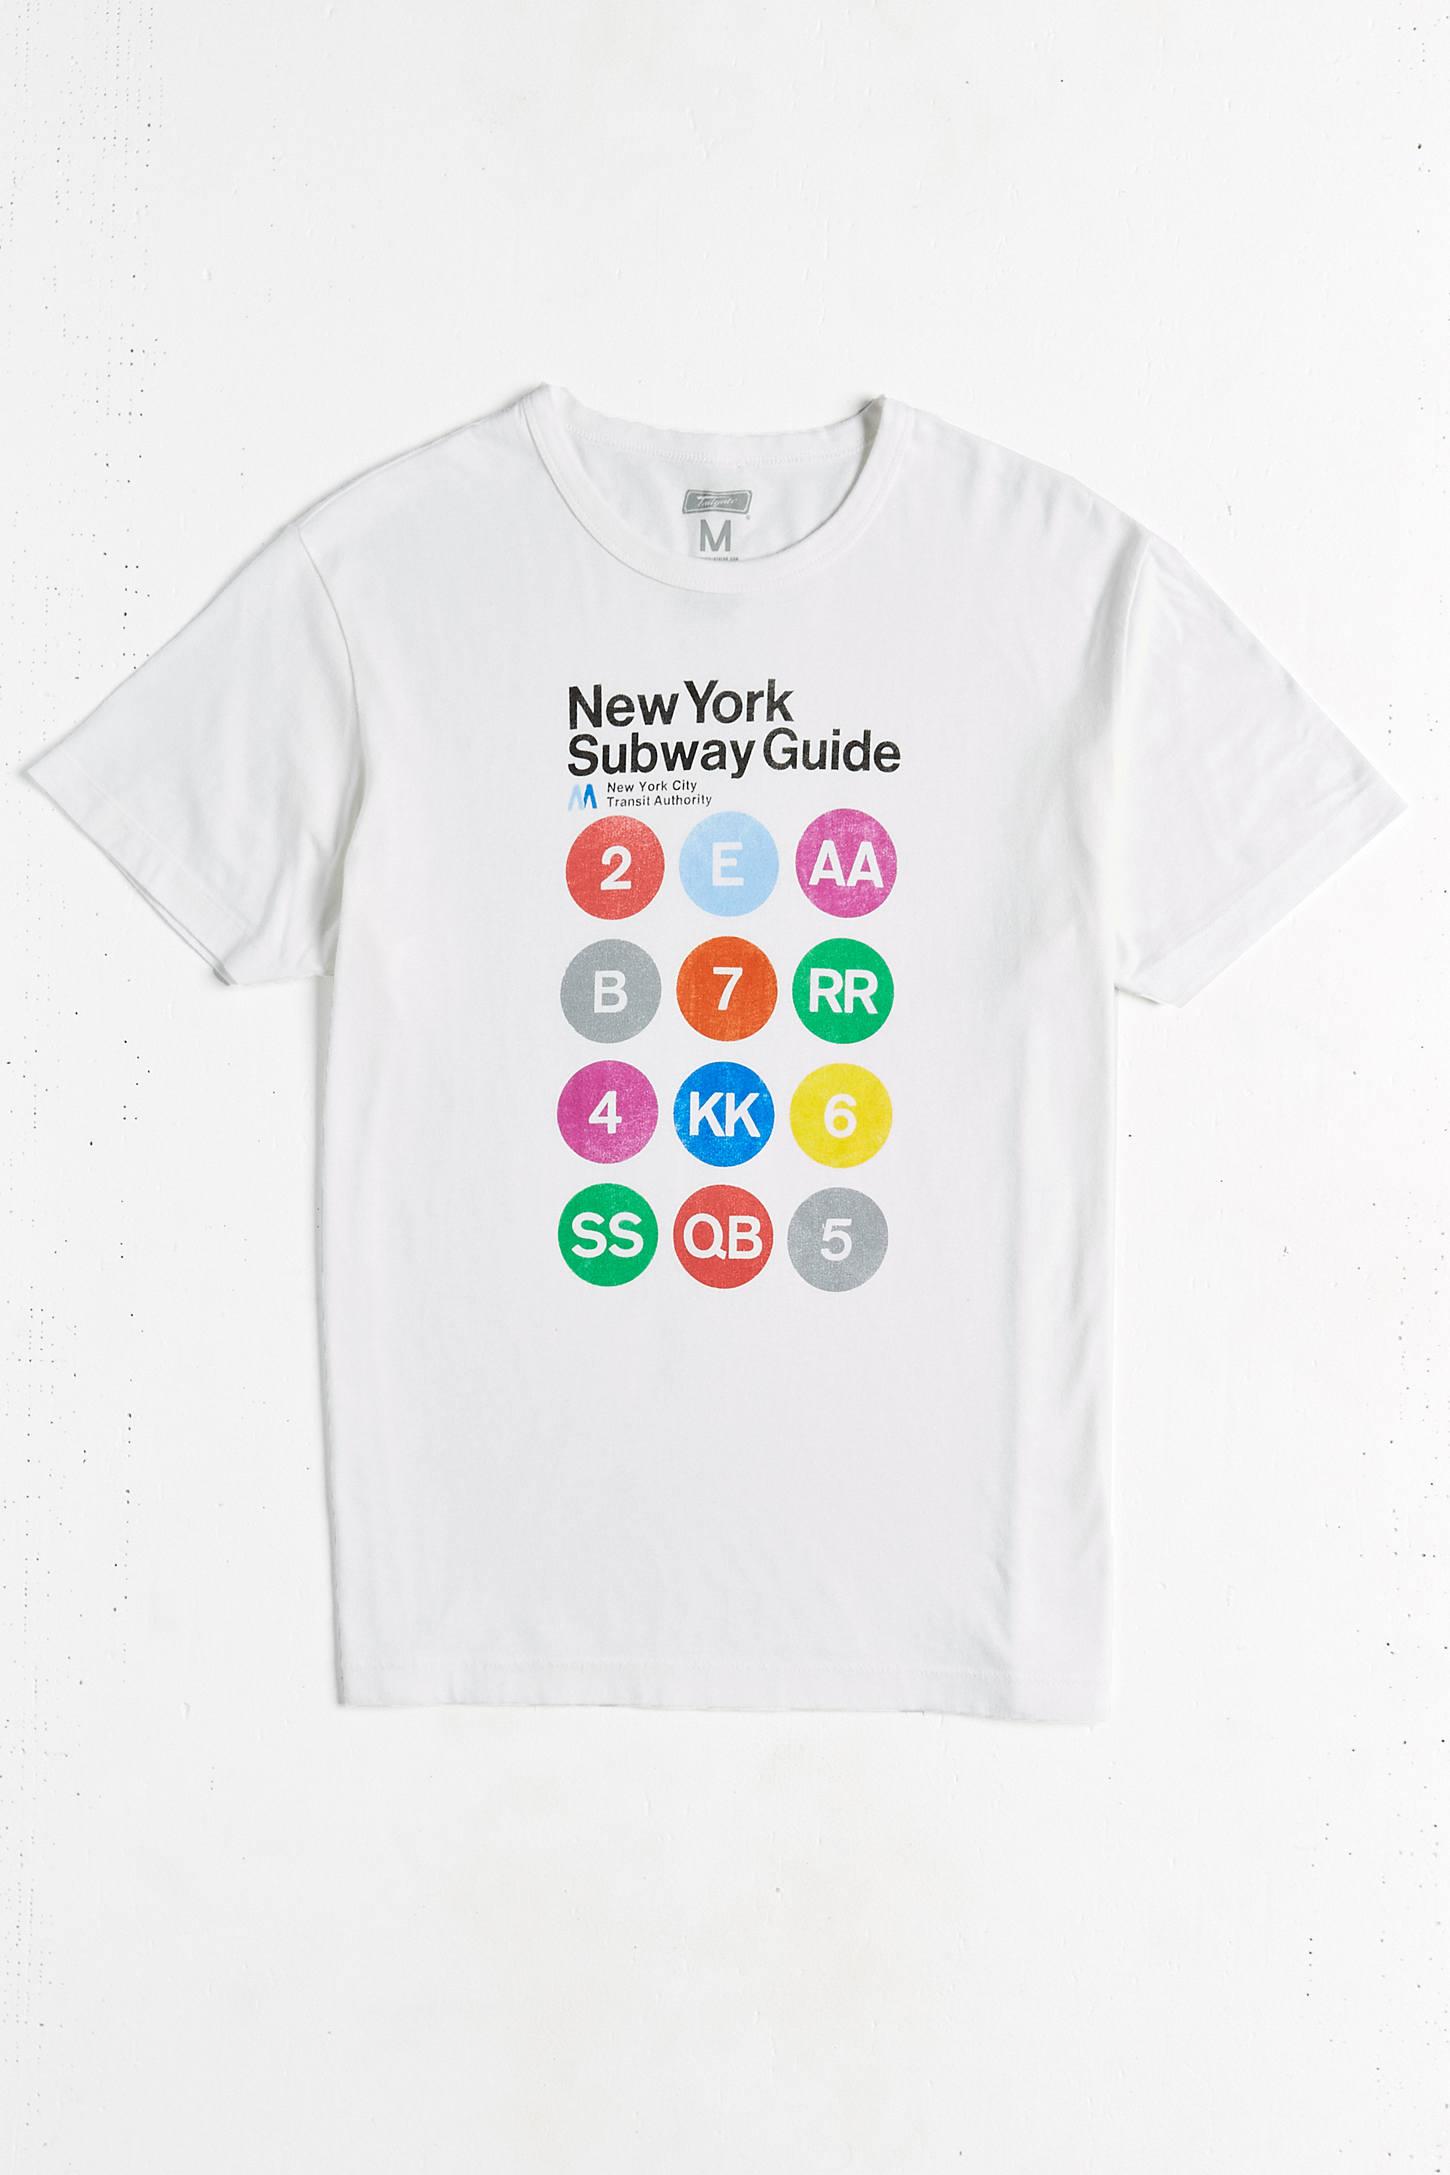 Nyc Subway Map Tshirt.New York Subway Map Tee Urban Outfitters